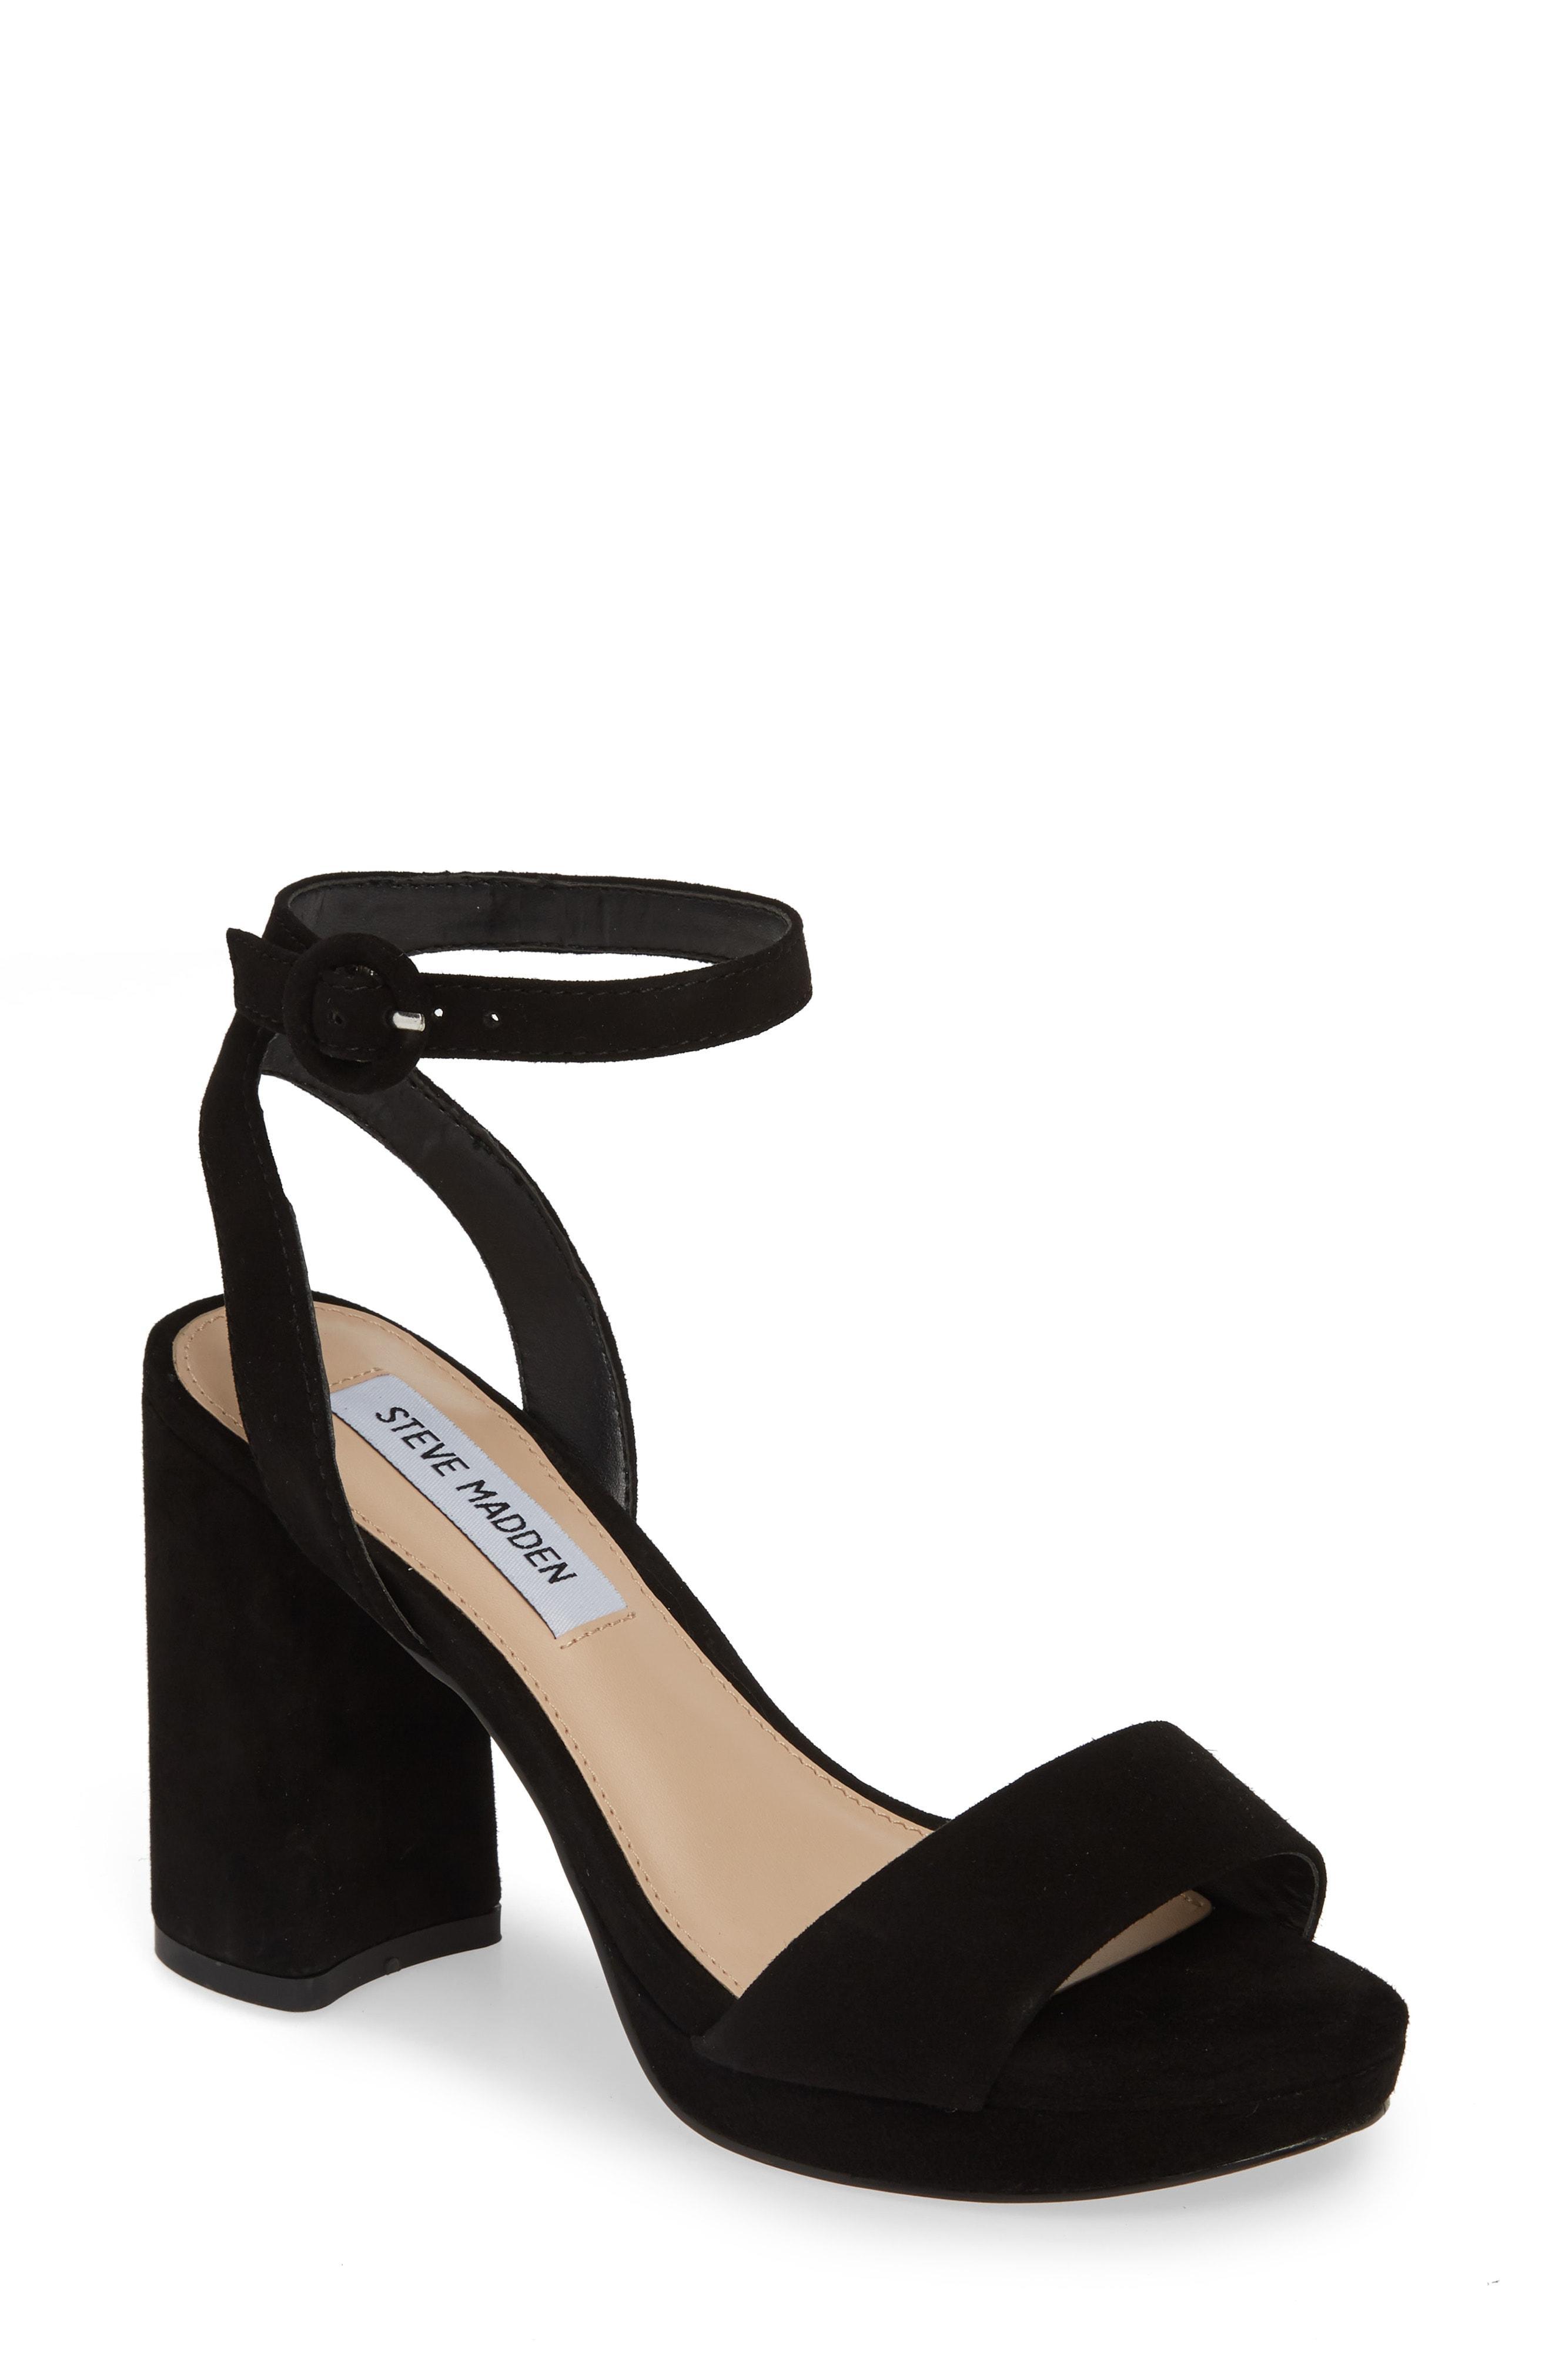 7d9476271db Lyst - Steve Madden Perch Platform Sandal in Black